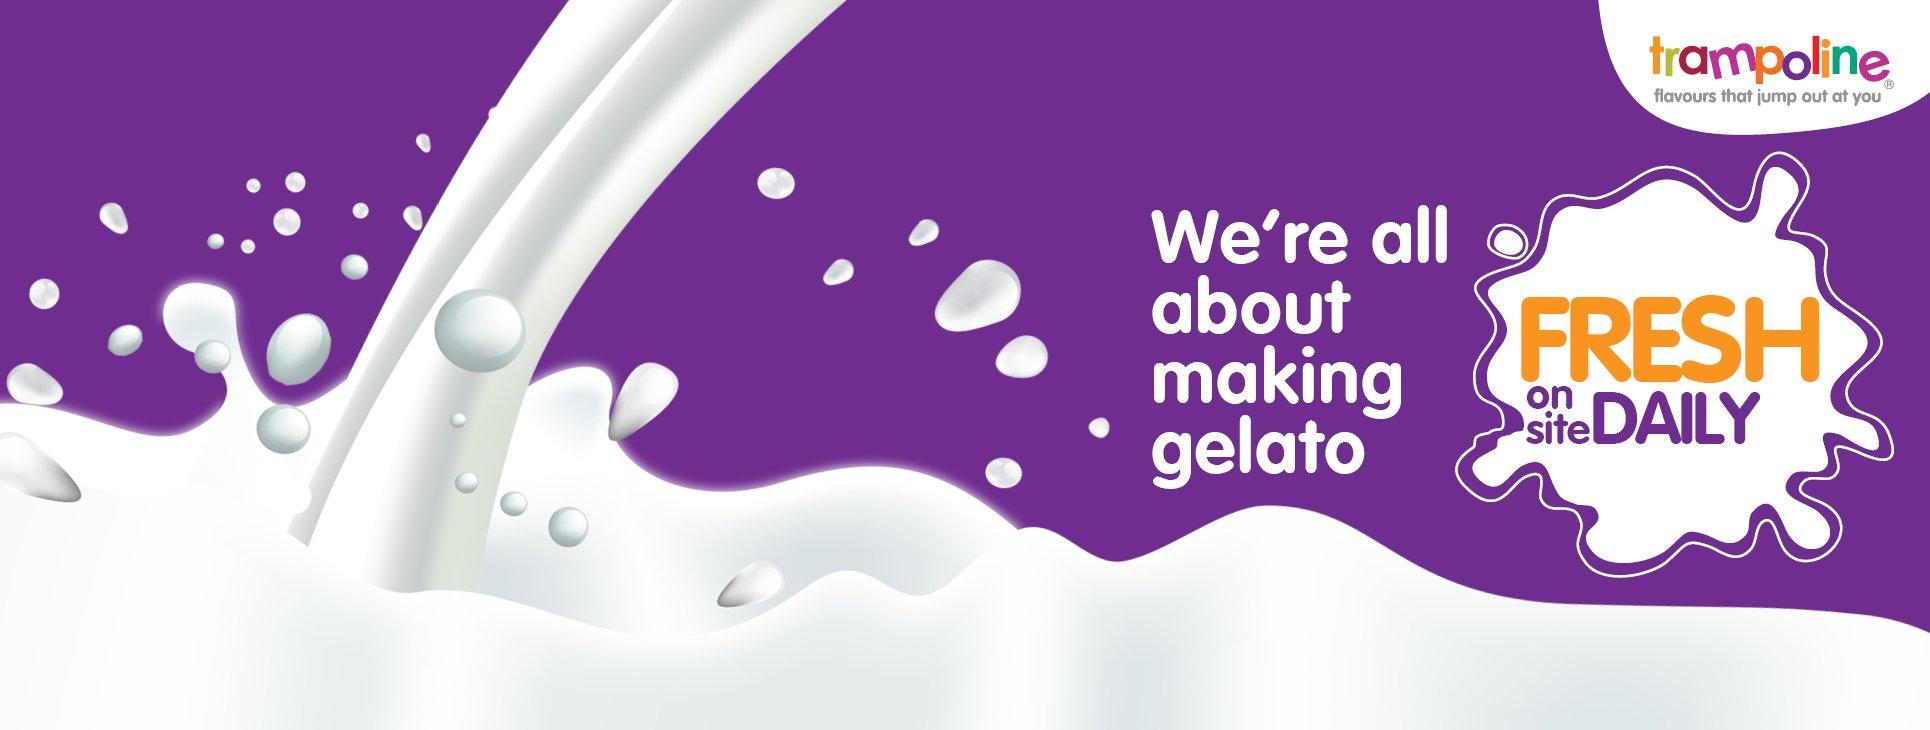 Tampoline Gelato Ice Cream Banner1